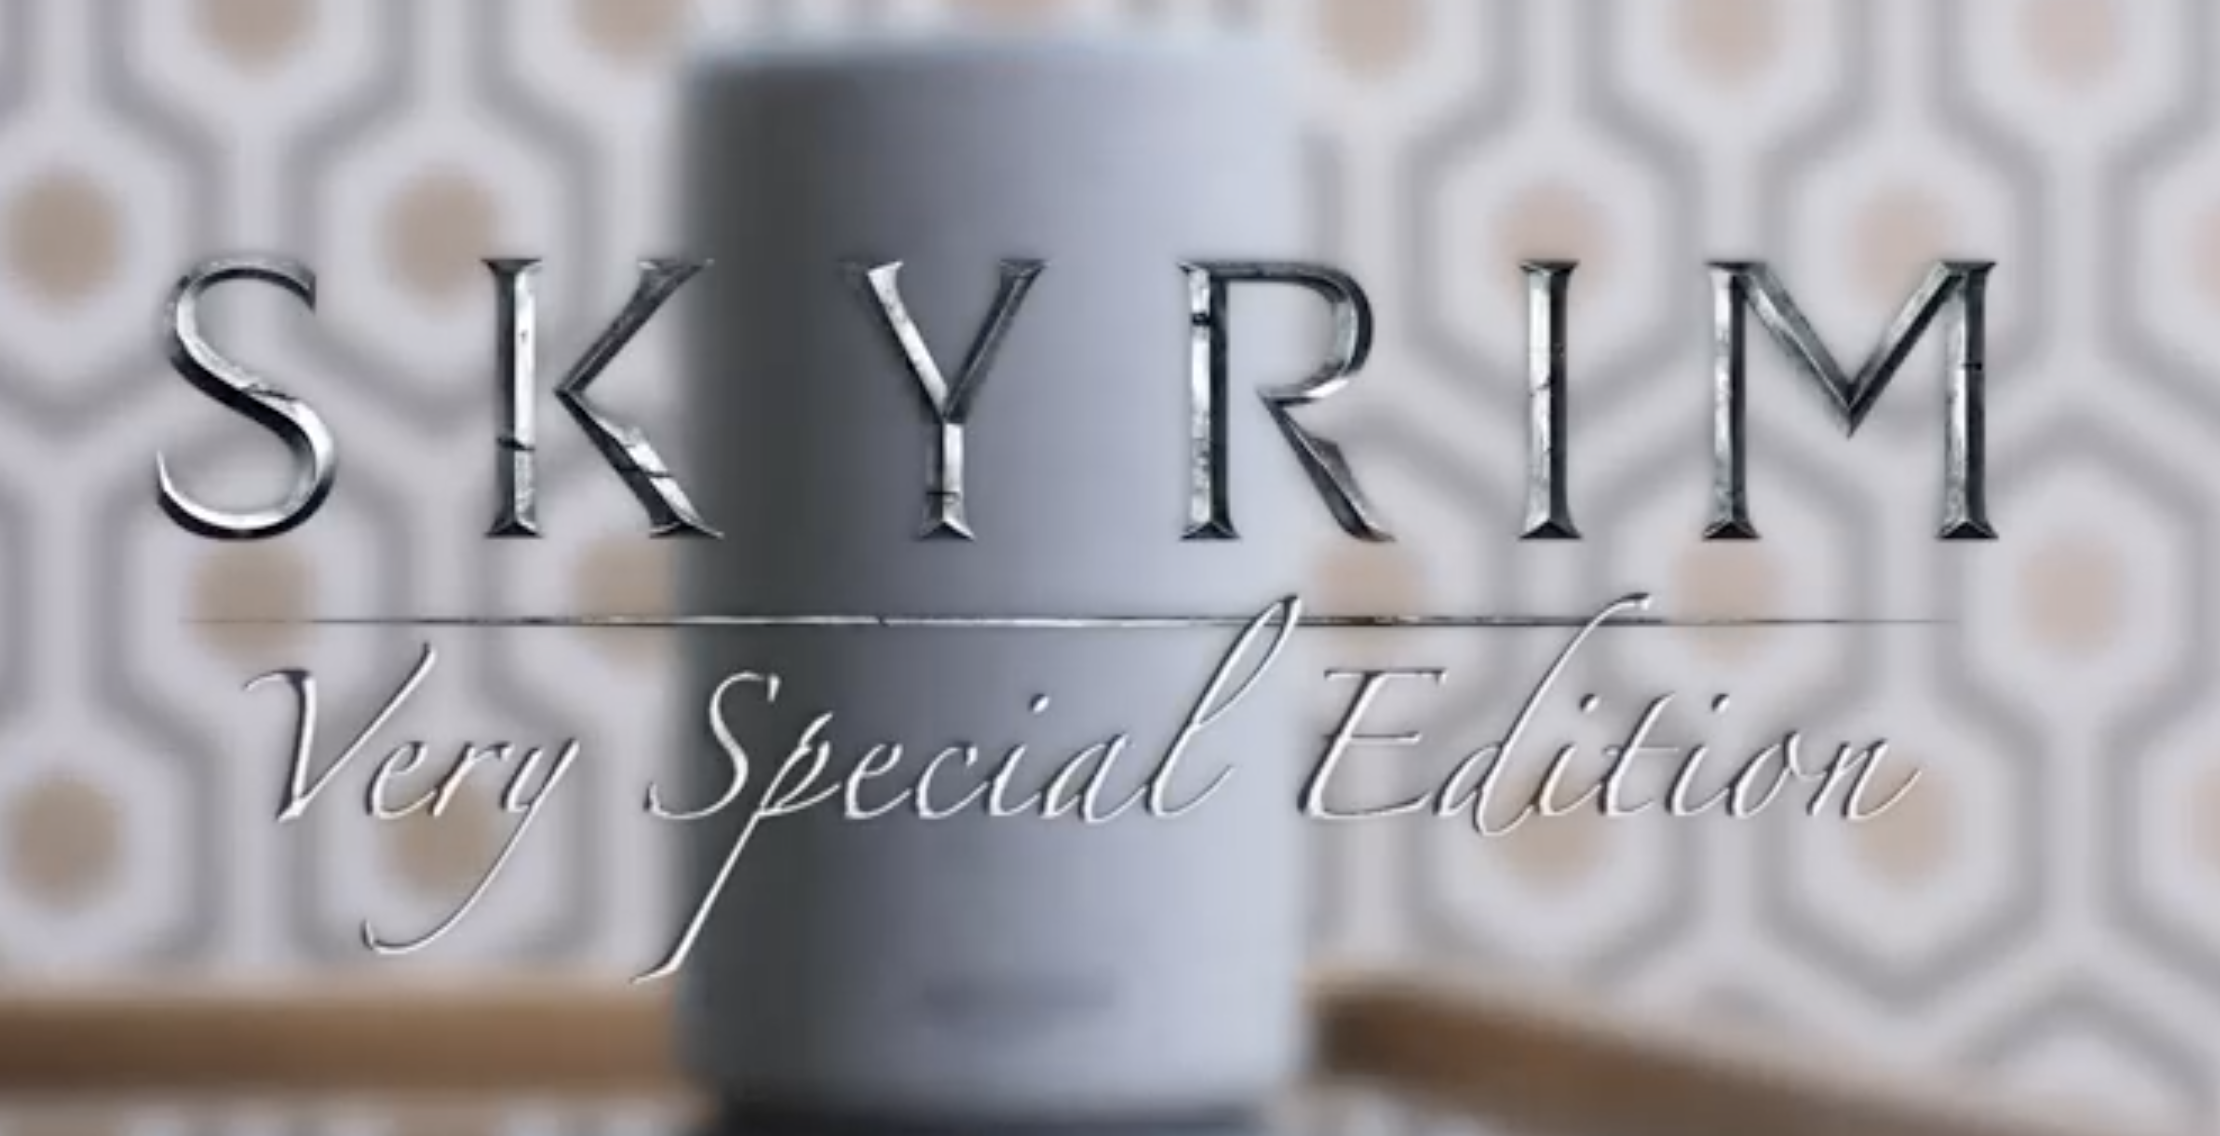 Alexa Skyrim how to get play amazon Bethesda e3 joke very special edition Keegan michael key